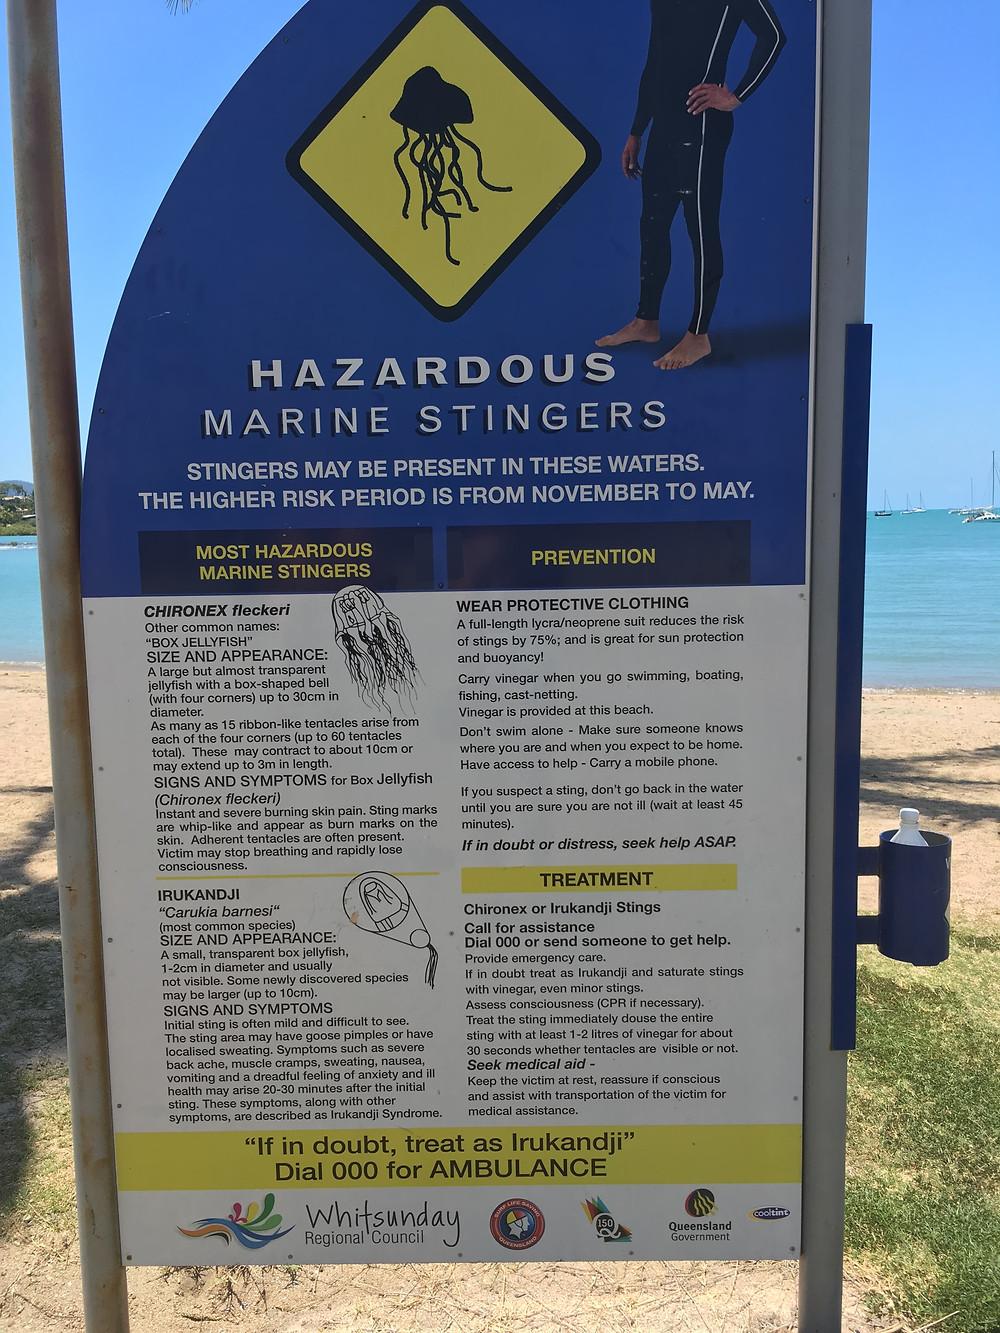 Jellyfish warning sign at a beach in Australia Whitsundays